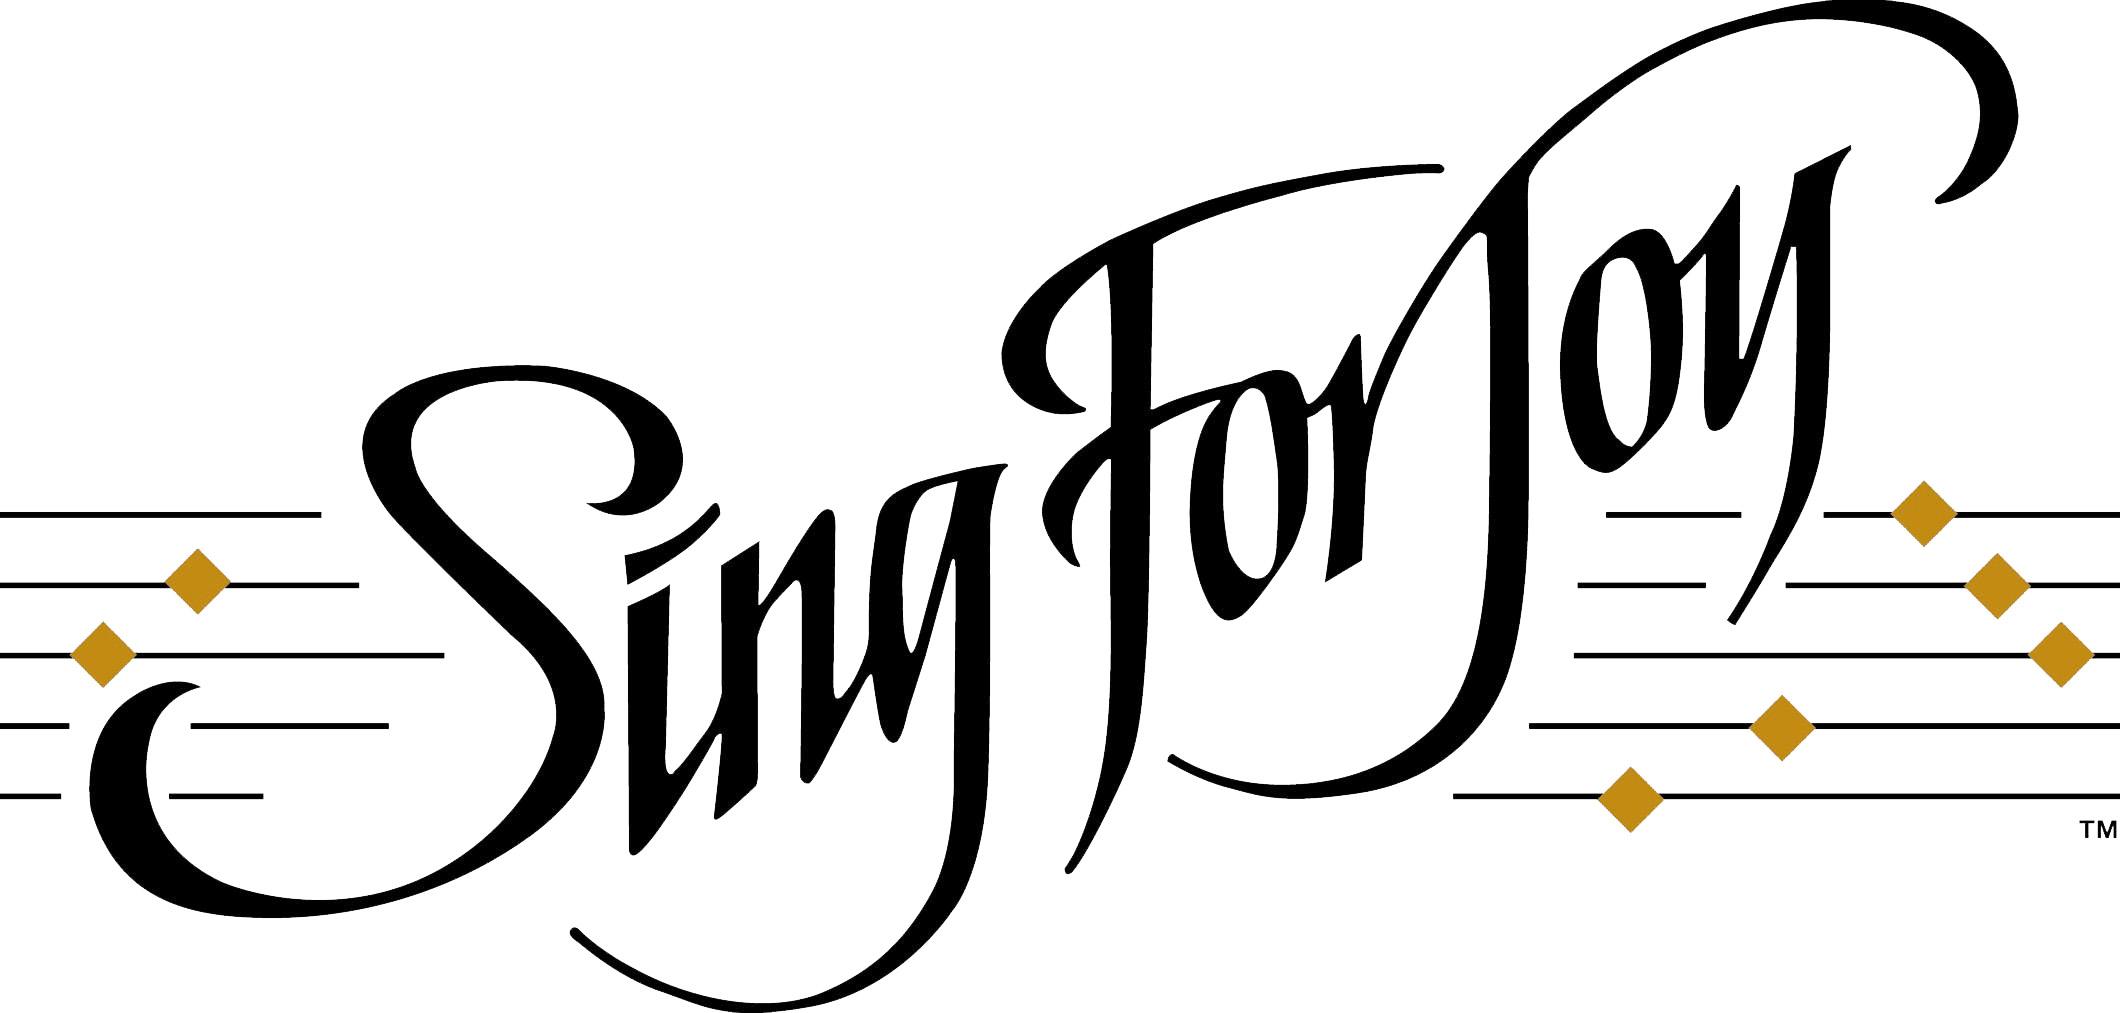 Clipart gospel music download jpg library library Free Choir Singers Cliparts, Download Free Clip Art, Free Clip Art ... jpg library library